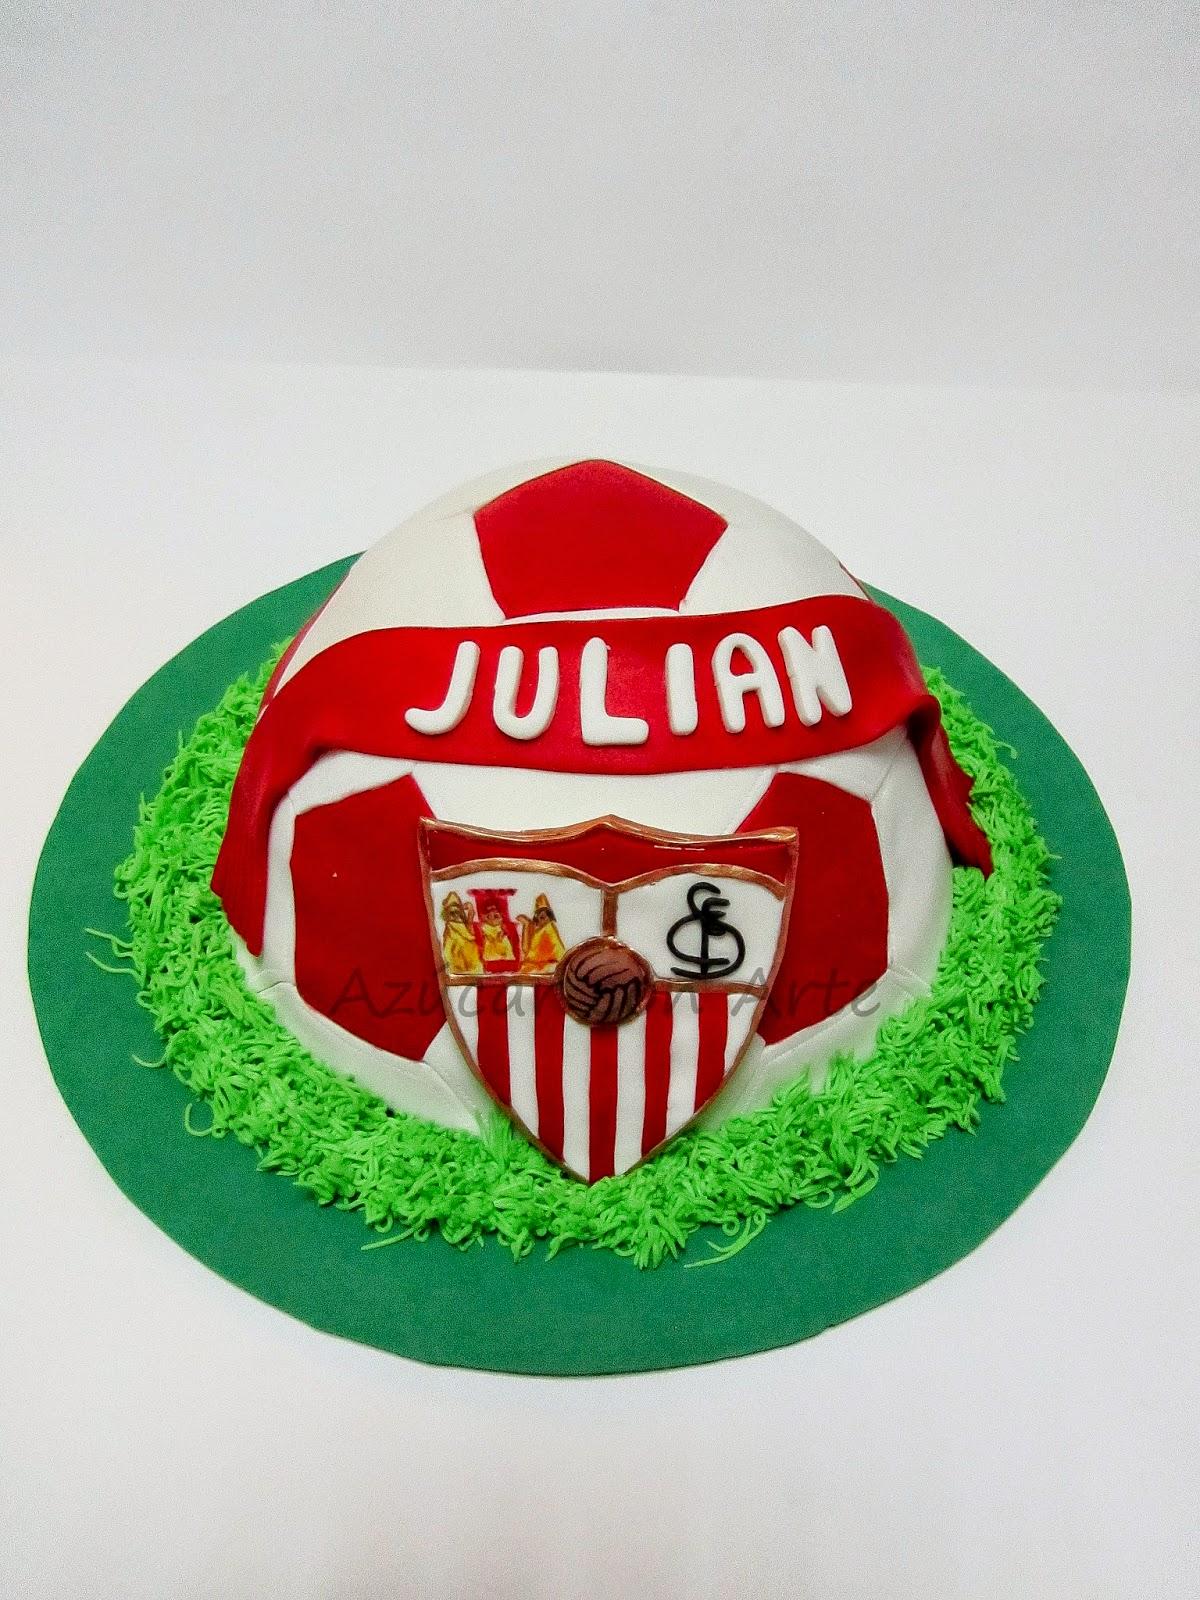 tarta balon, ball cake, tarta sevilla, tarta sin gluten, gluten free cake | azucar con arte